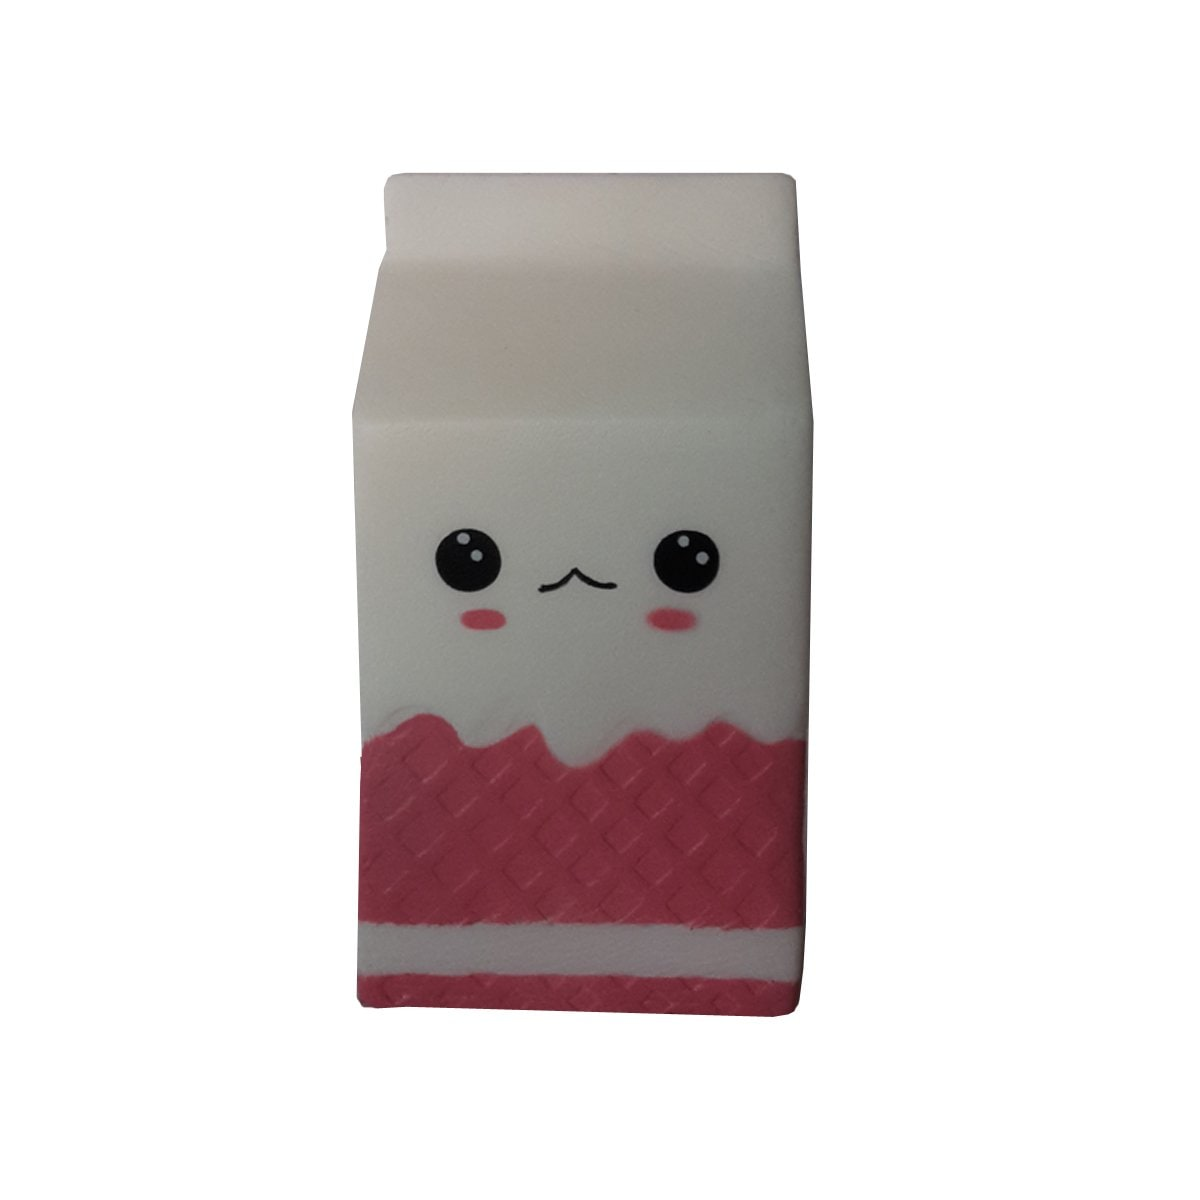 Squishy Cartón de Leche Price Laser